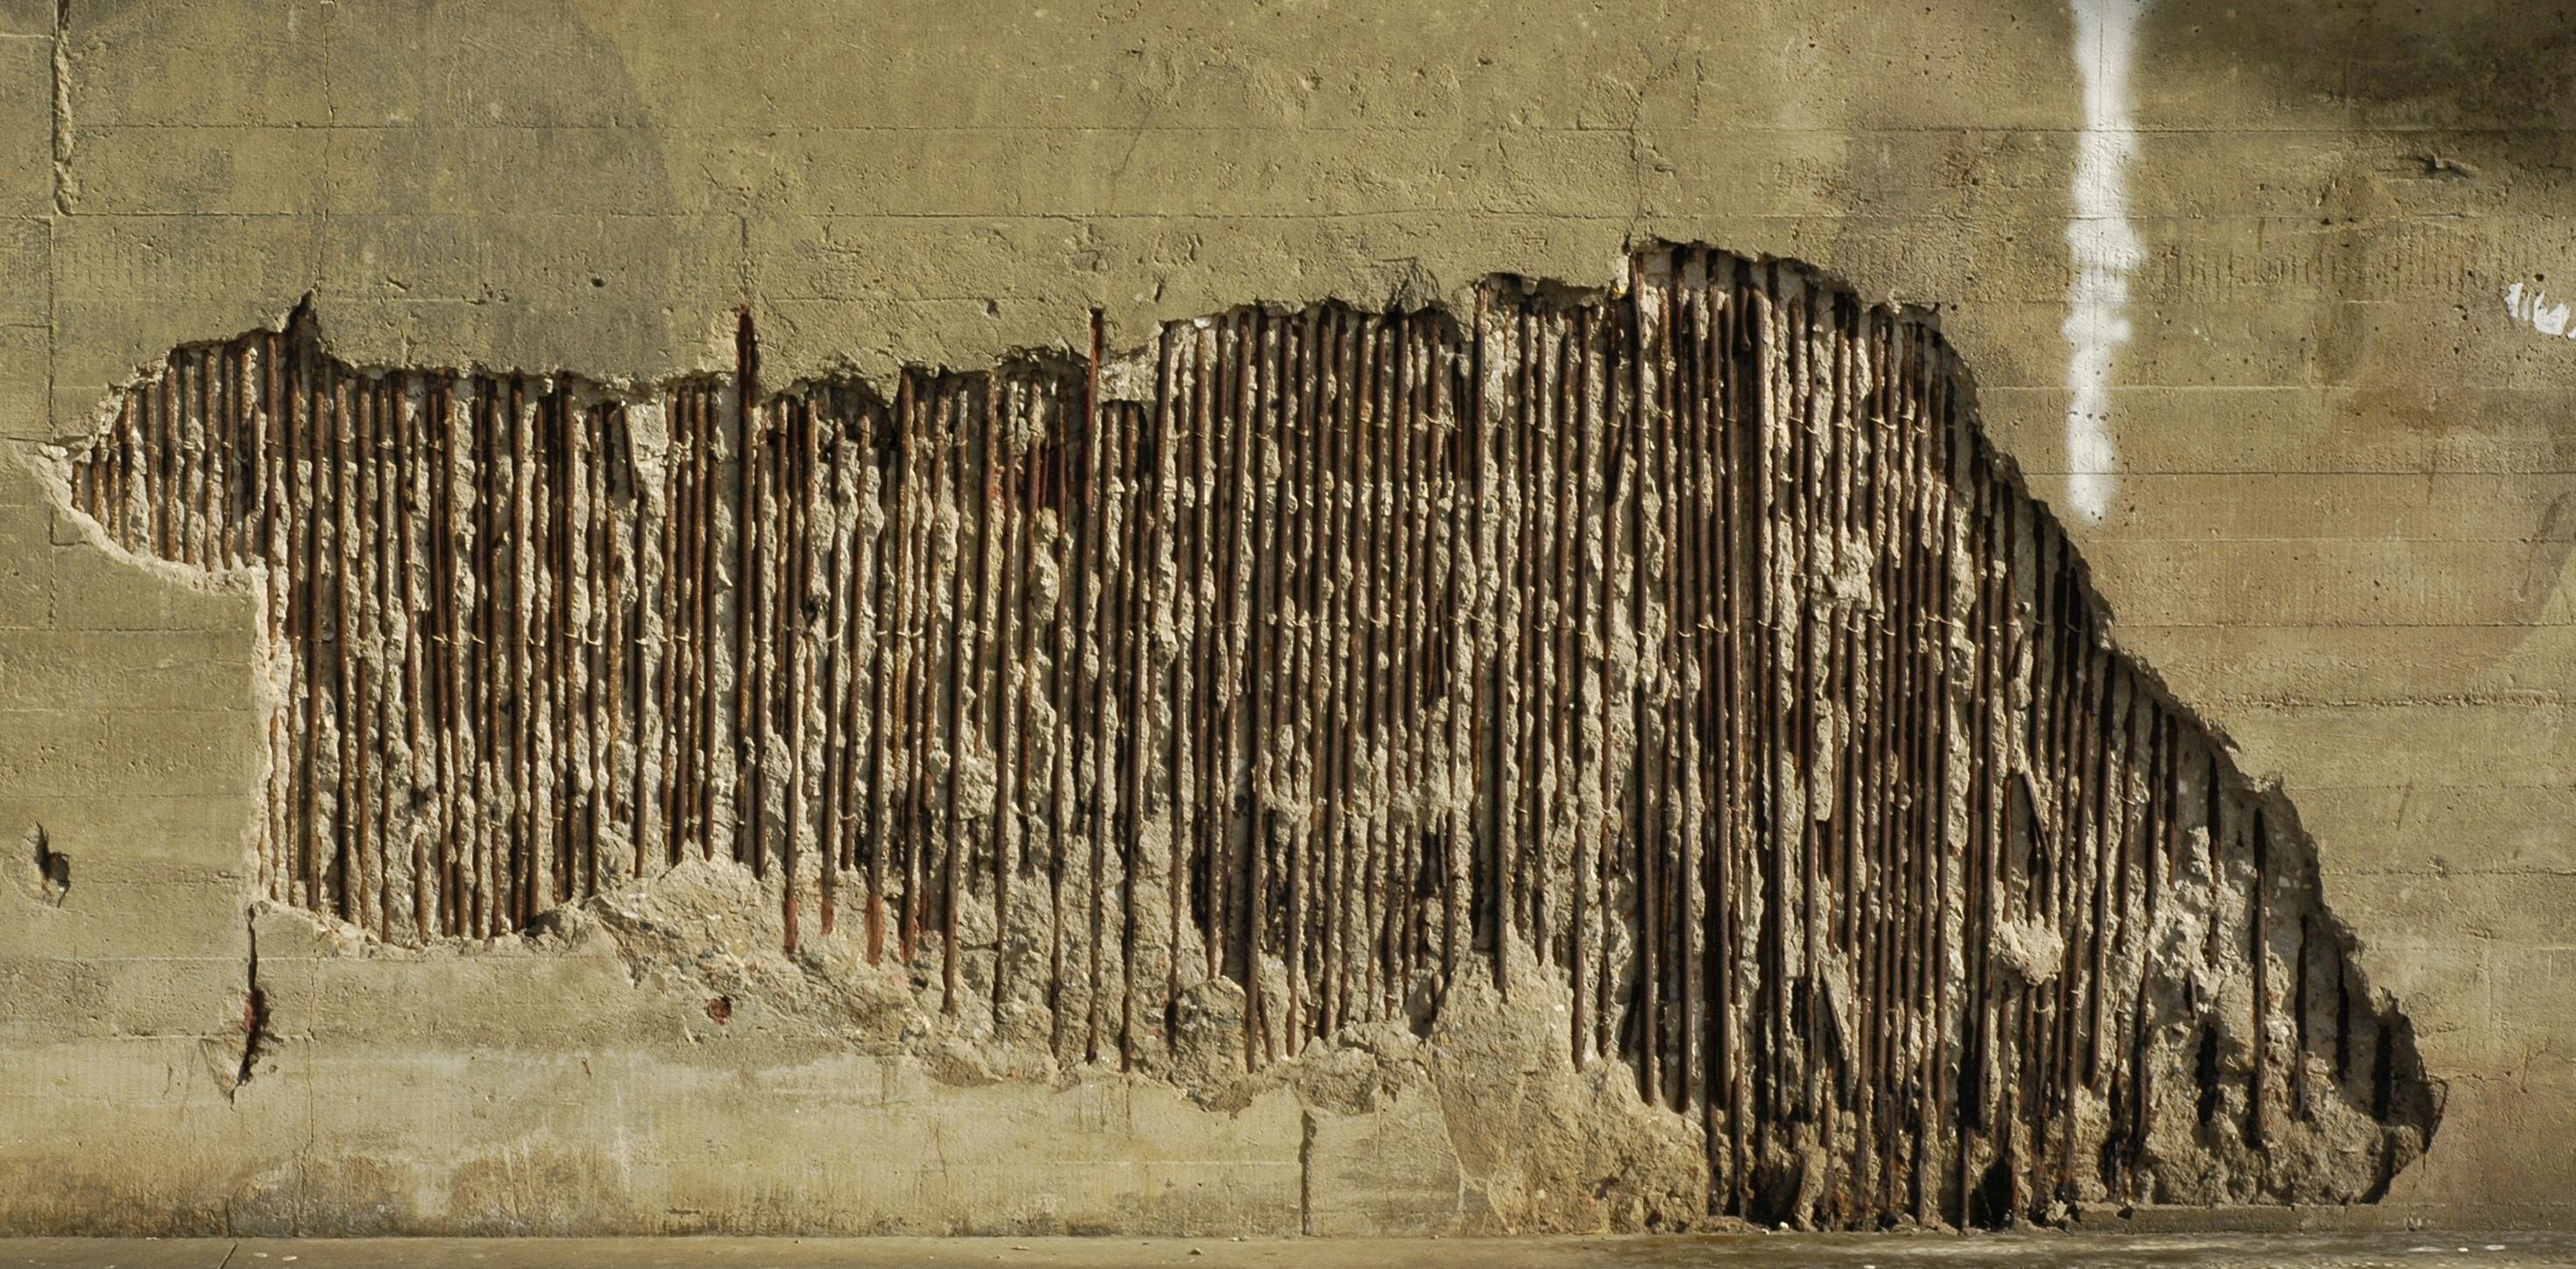 Gambar Batu Kayu Dinding Pedesaan Pembentukan Bata Medan